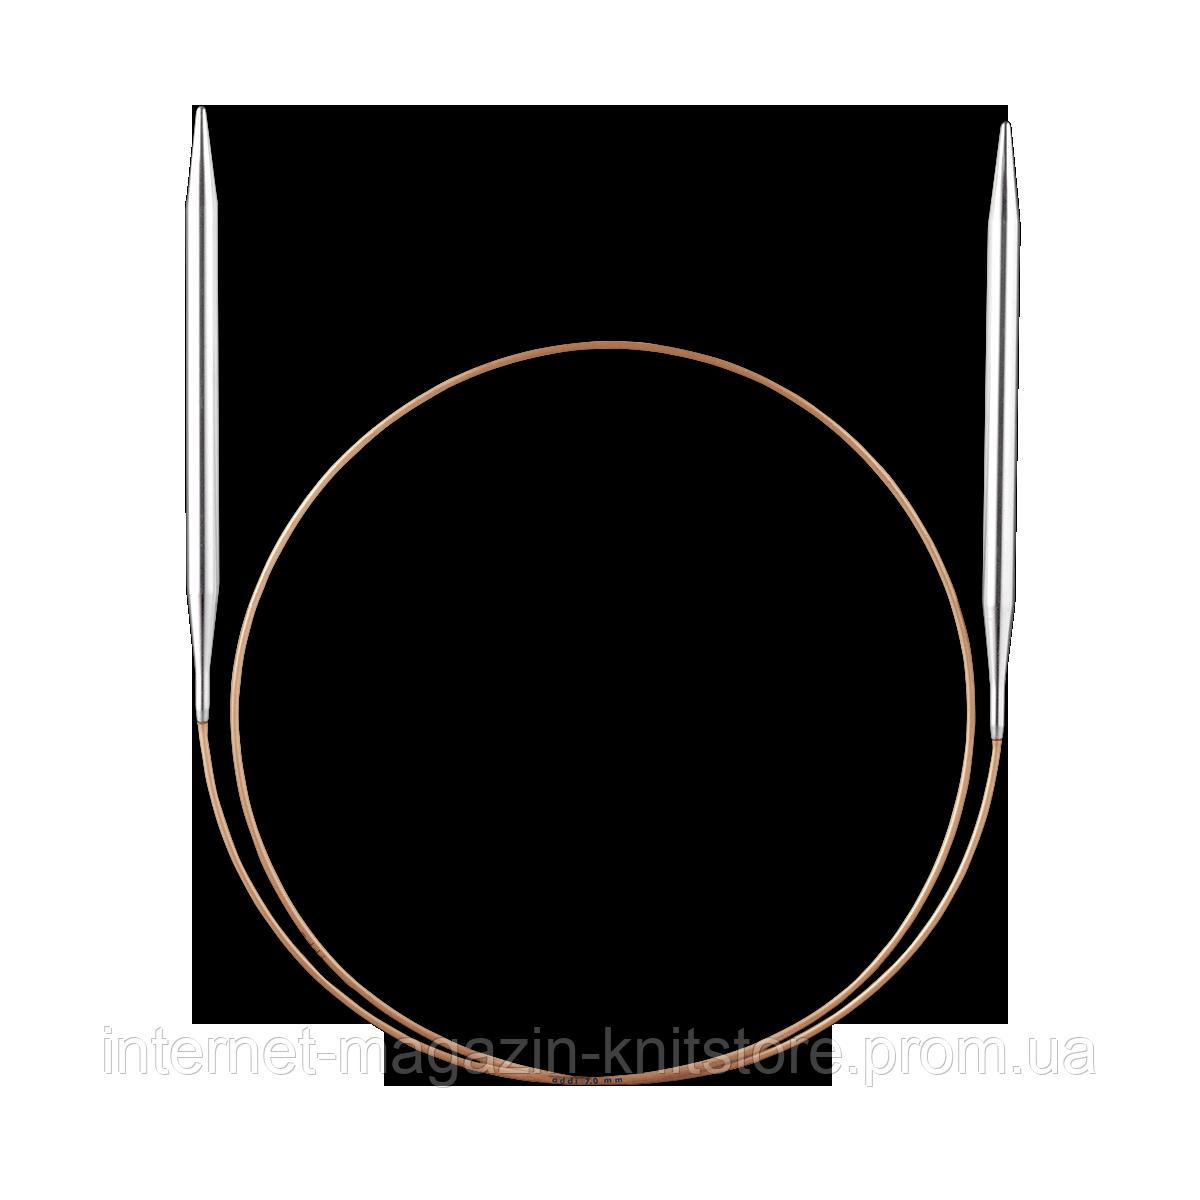 Спицы Addi 40 см/4 мм круговые